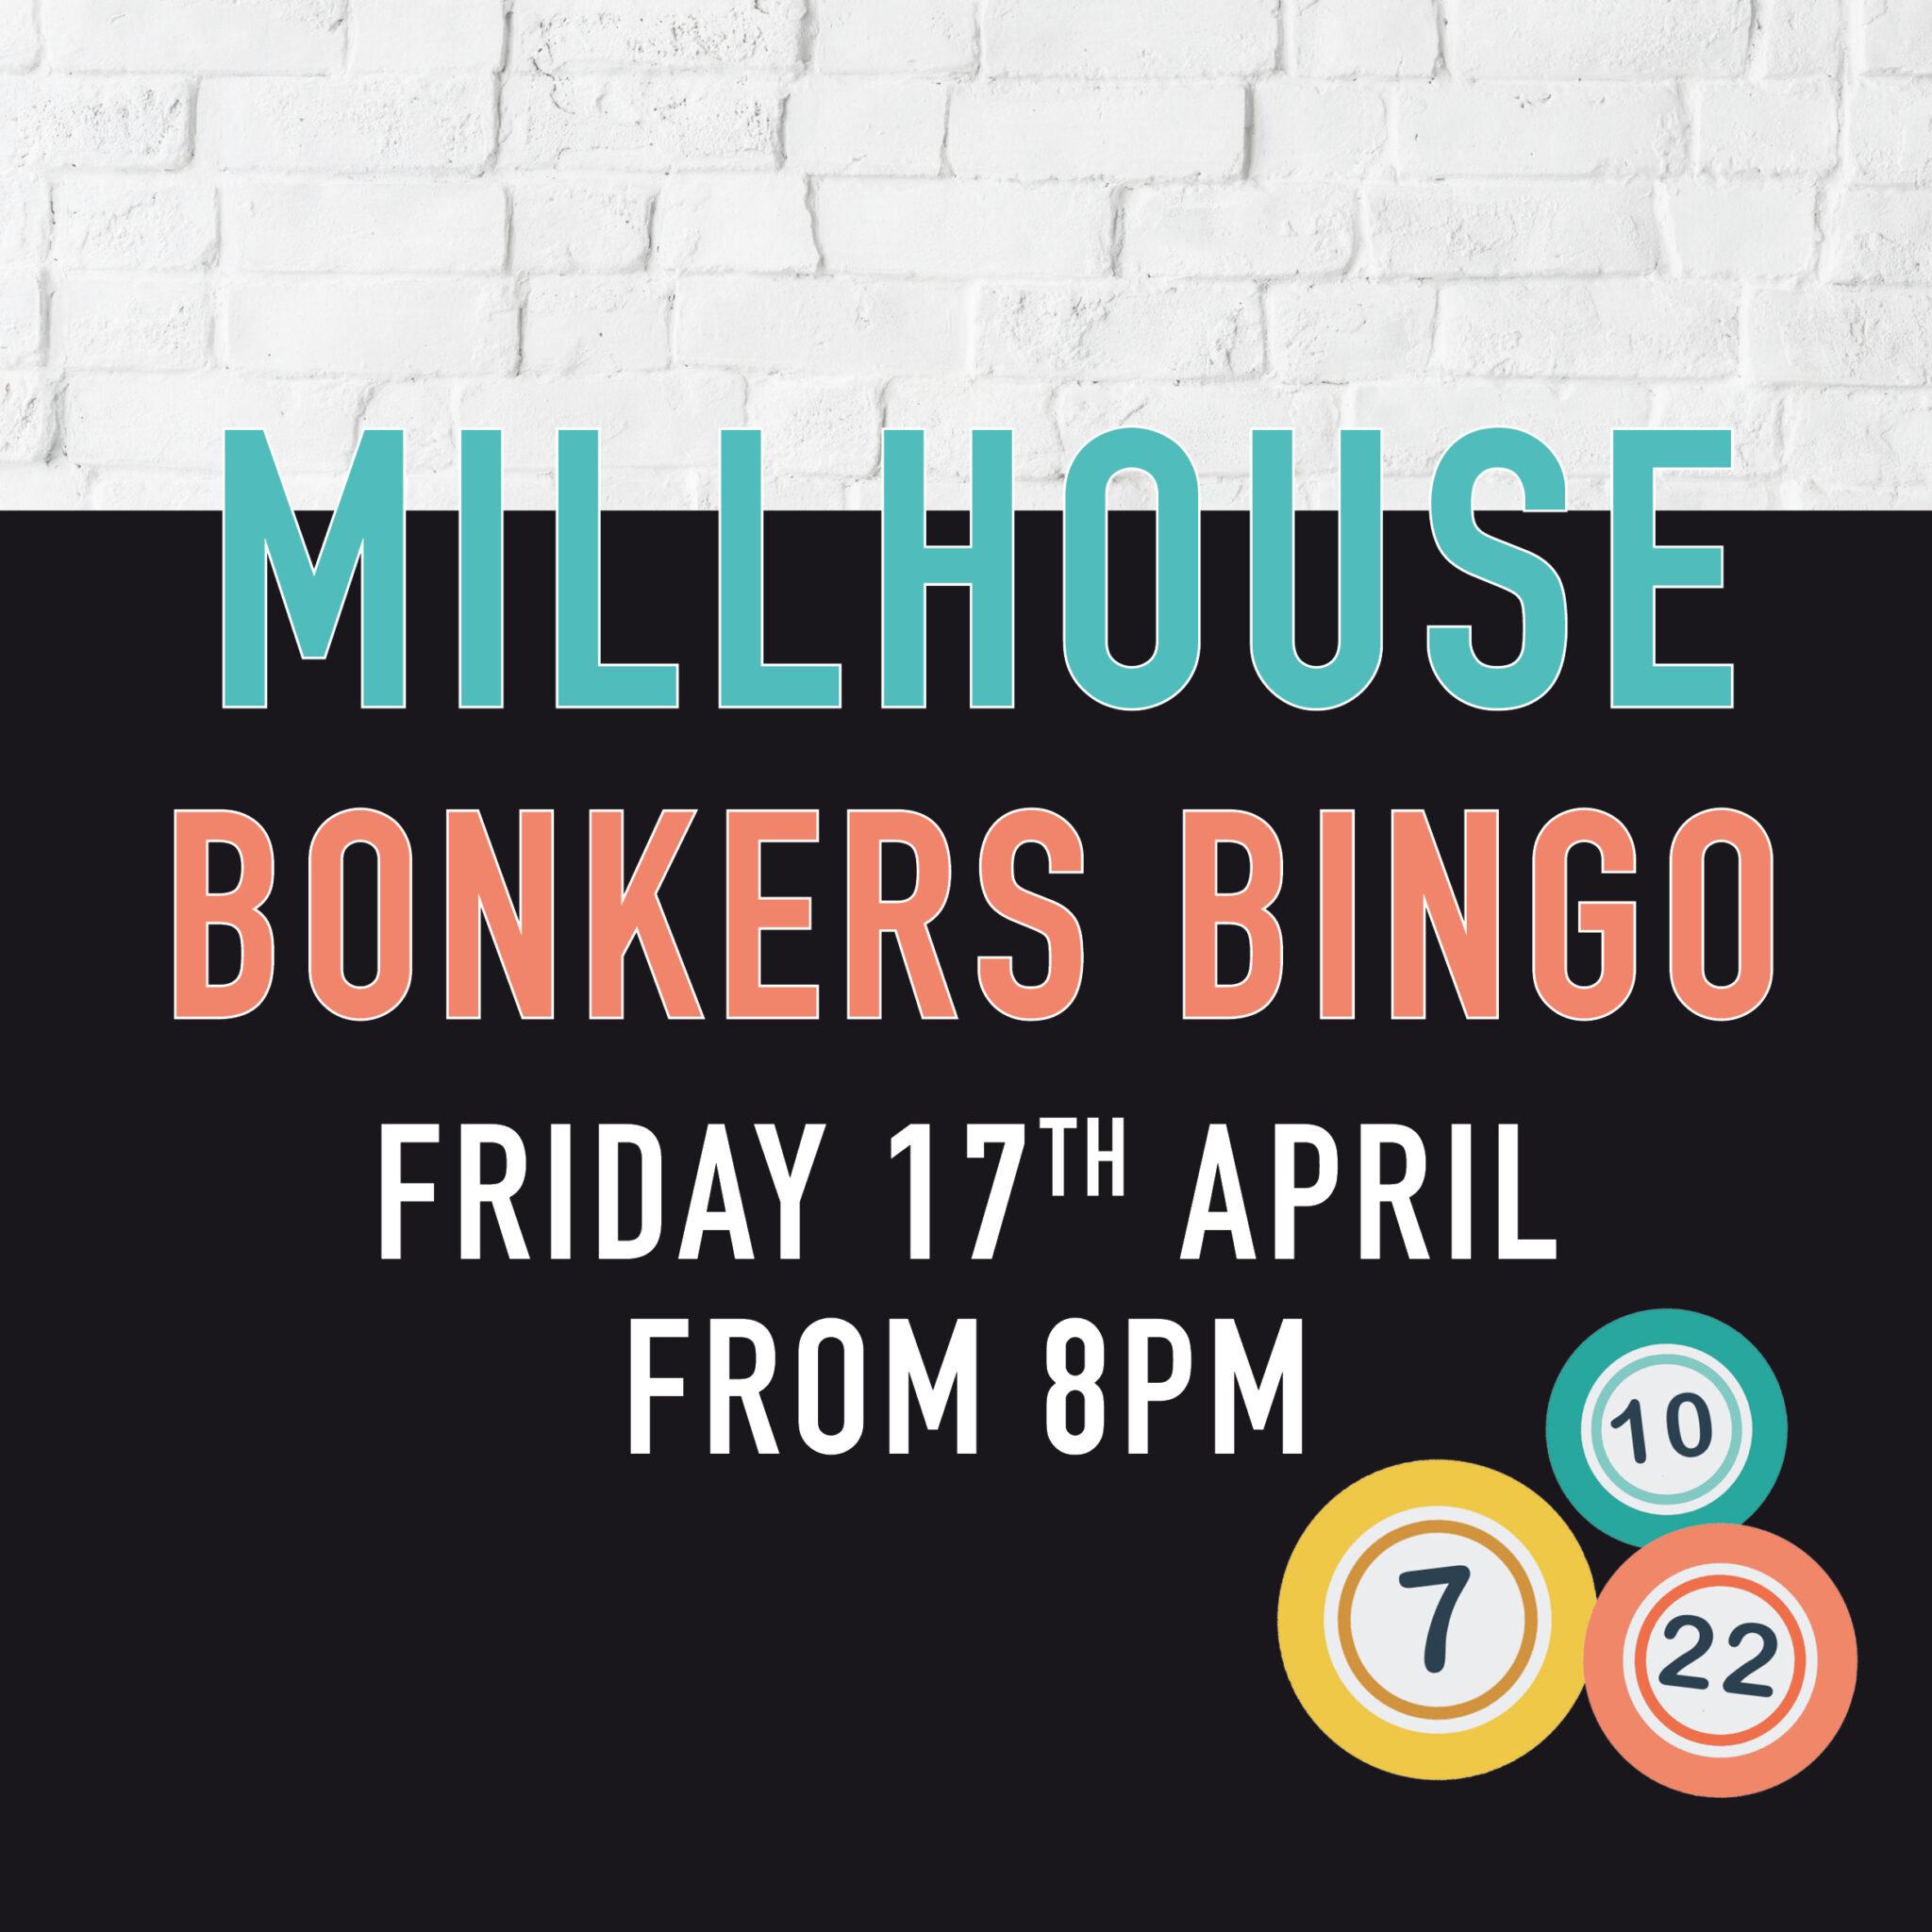 Millhouse Bonkers Bingo Millhouse